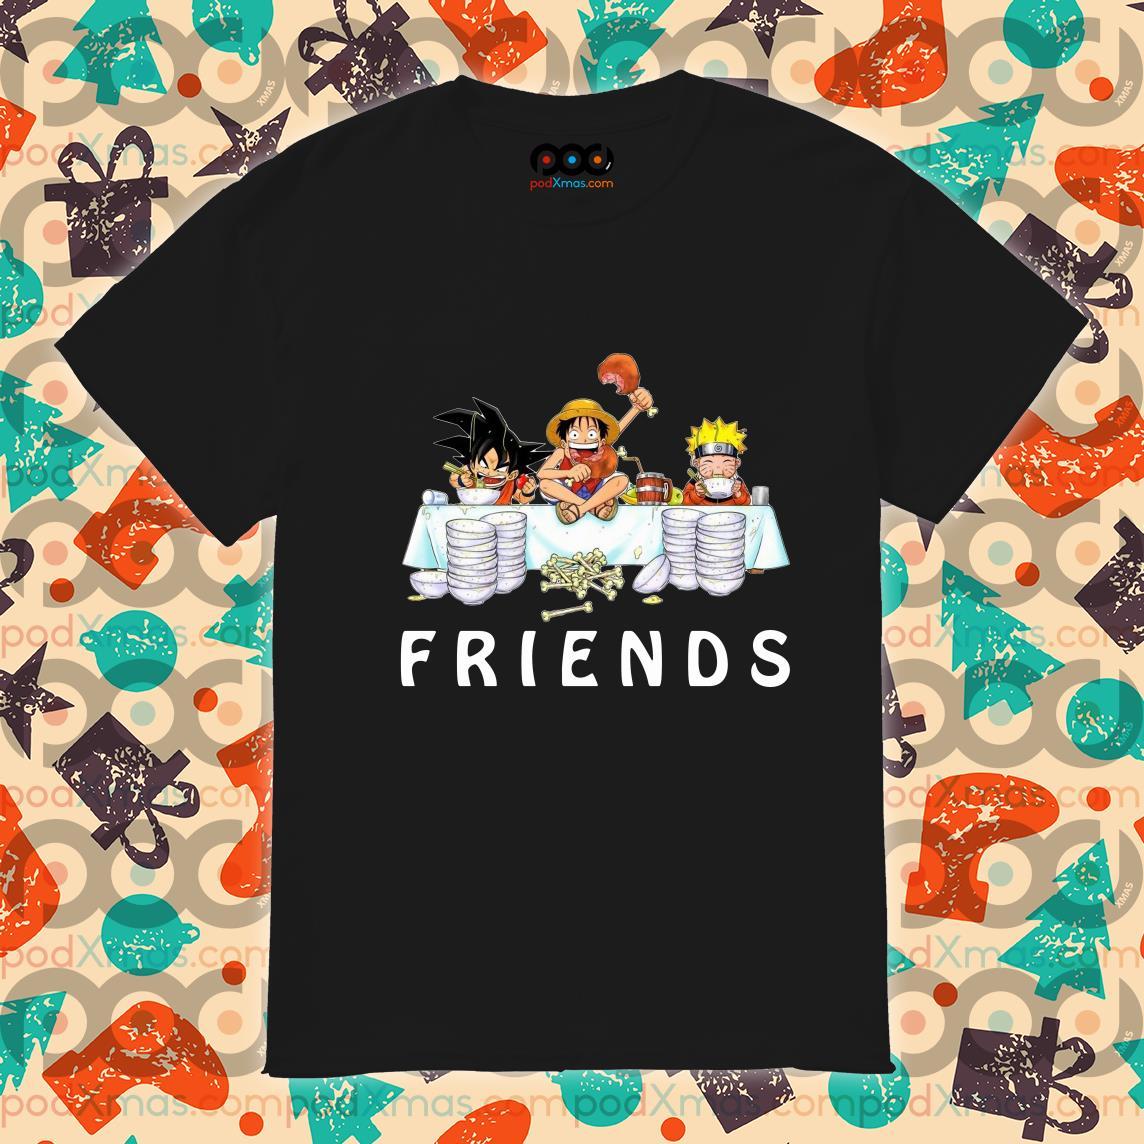 Son Goku Luffy and Naruto Friends shirt